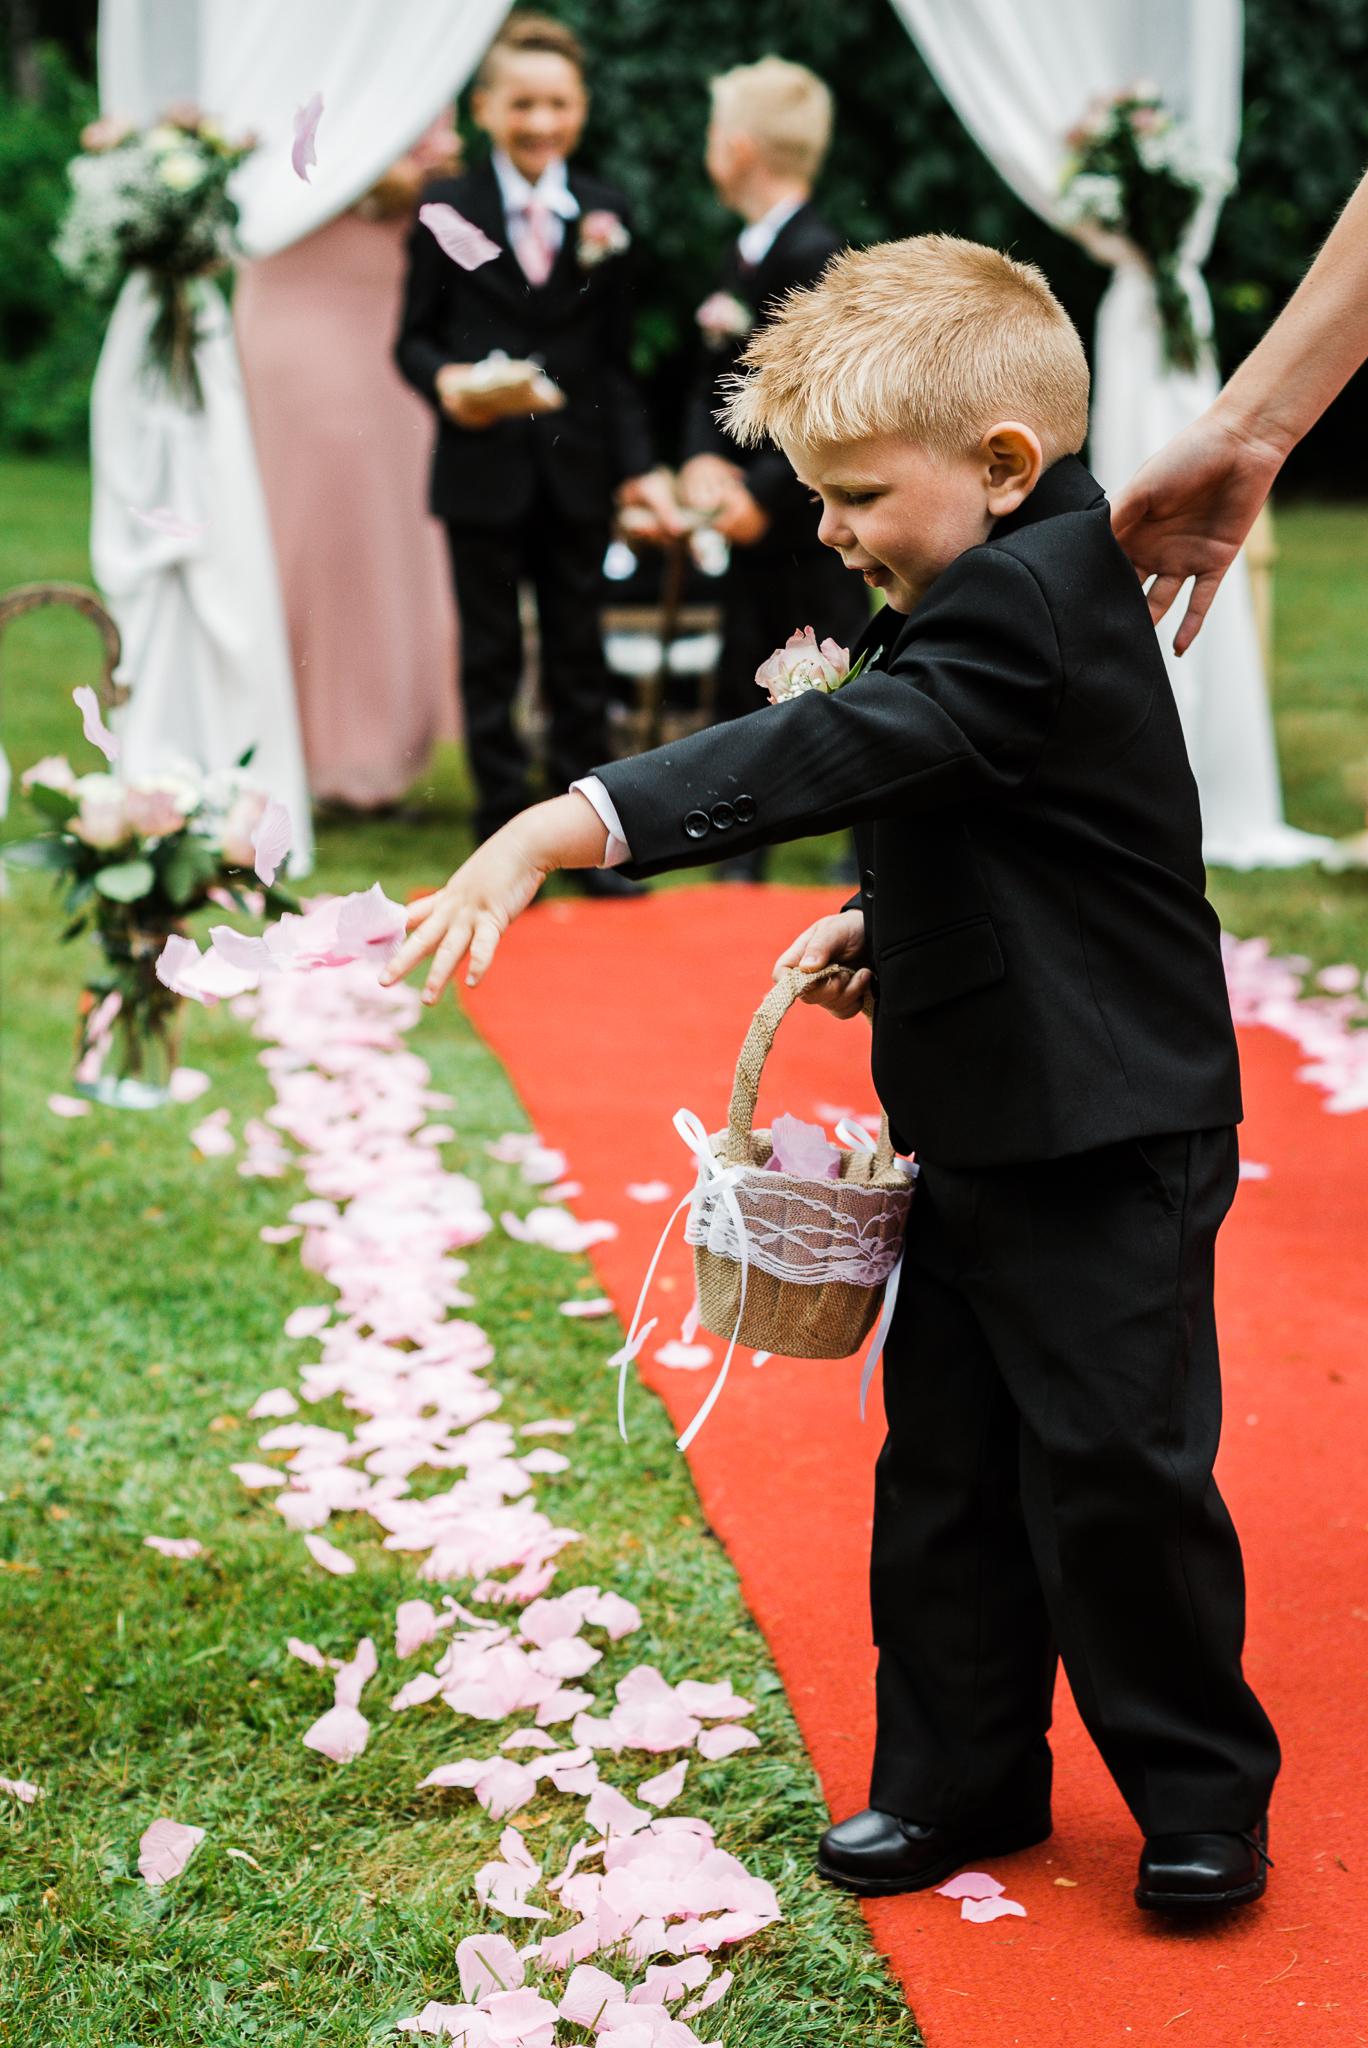 Bryllup_web12.jpg